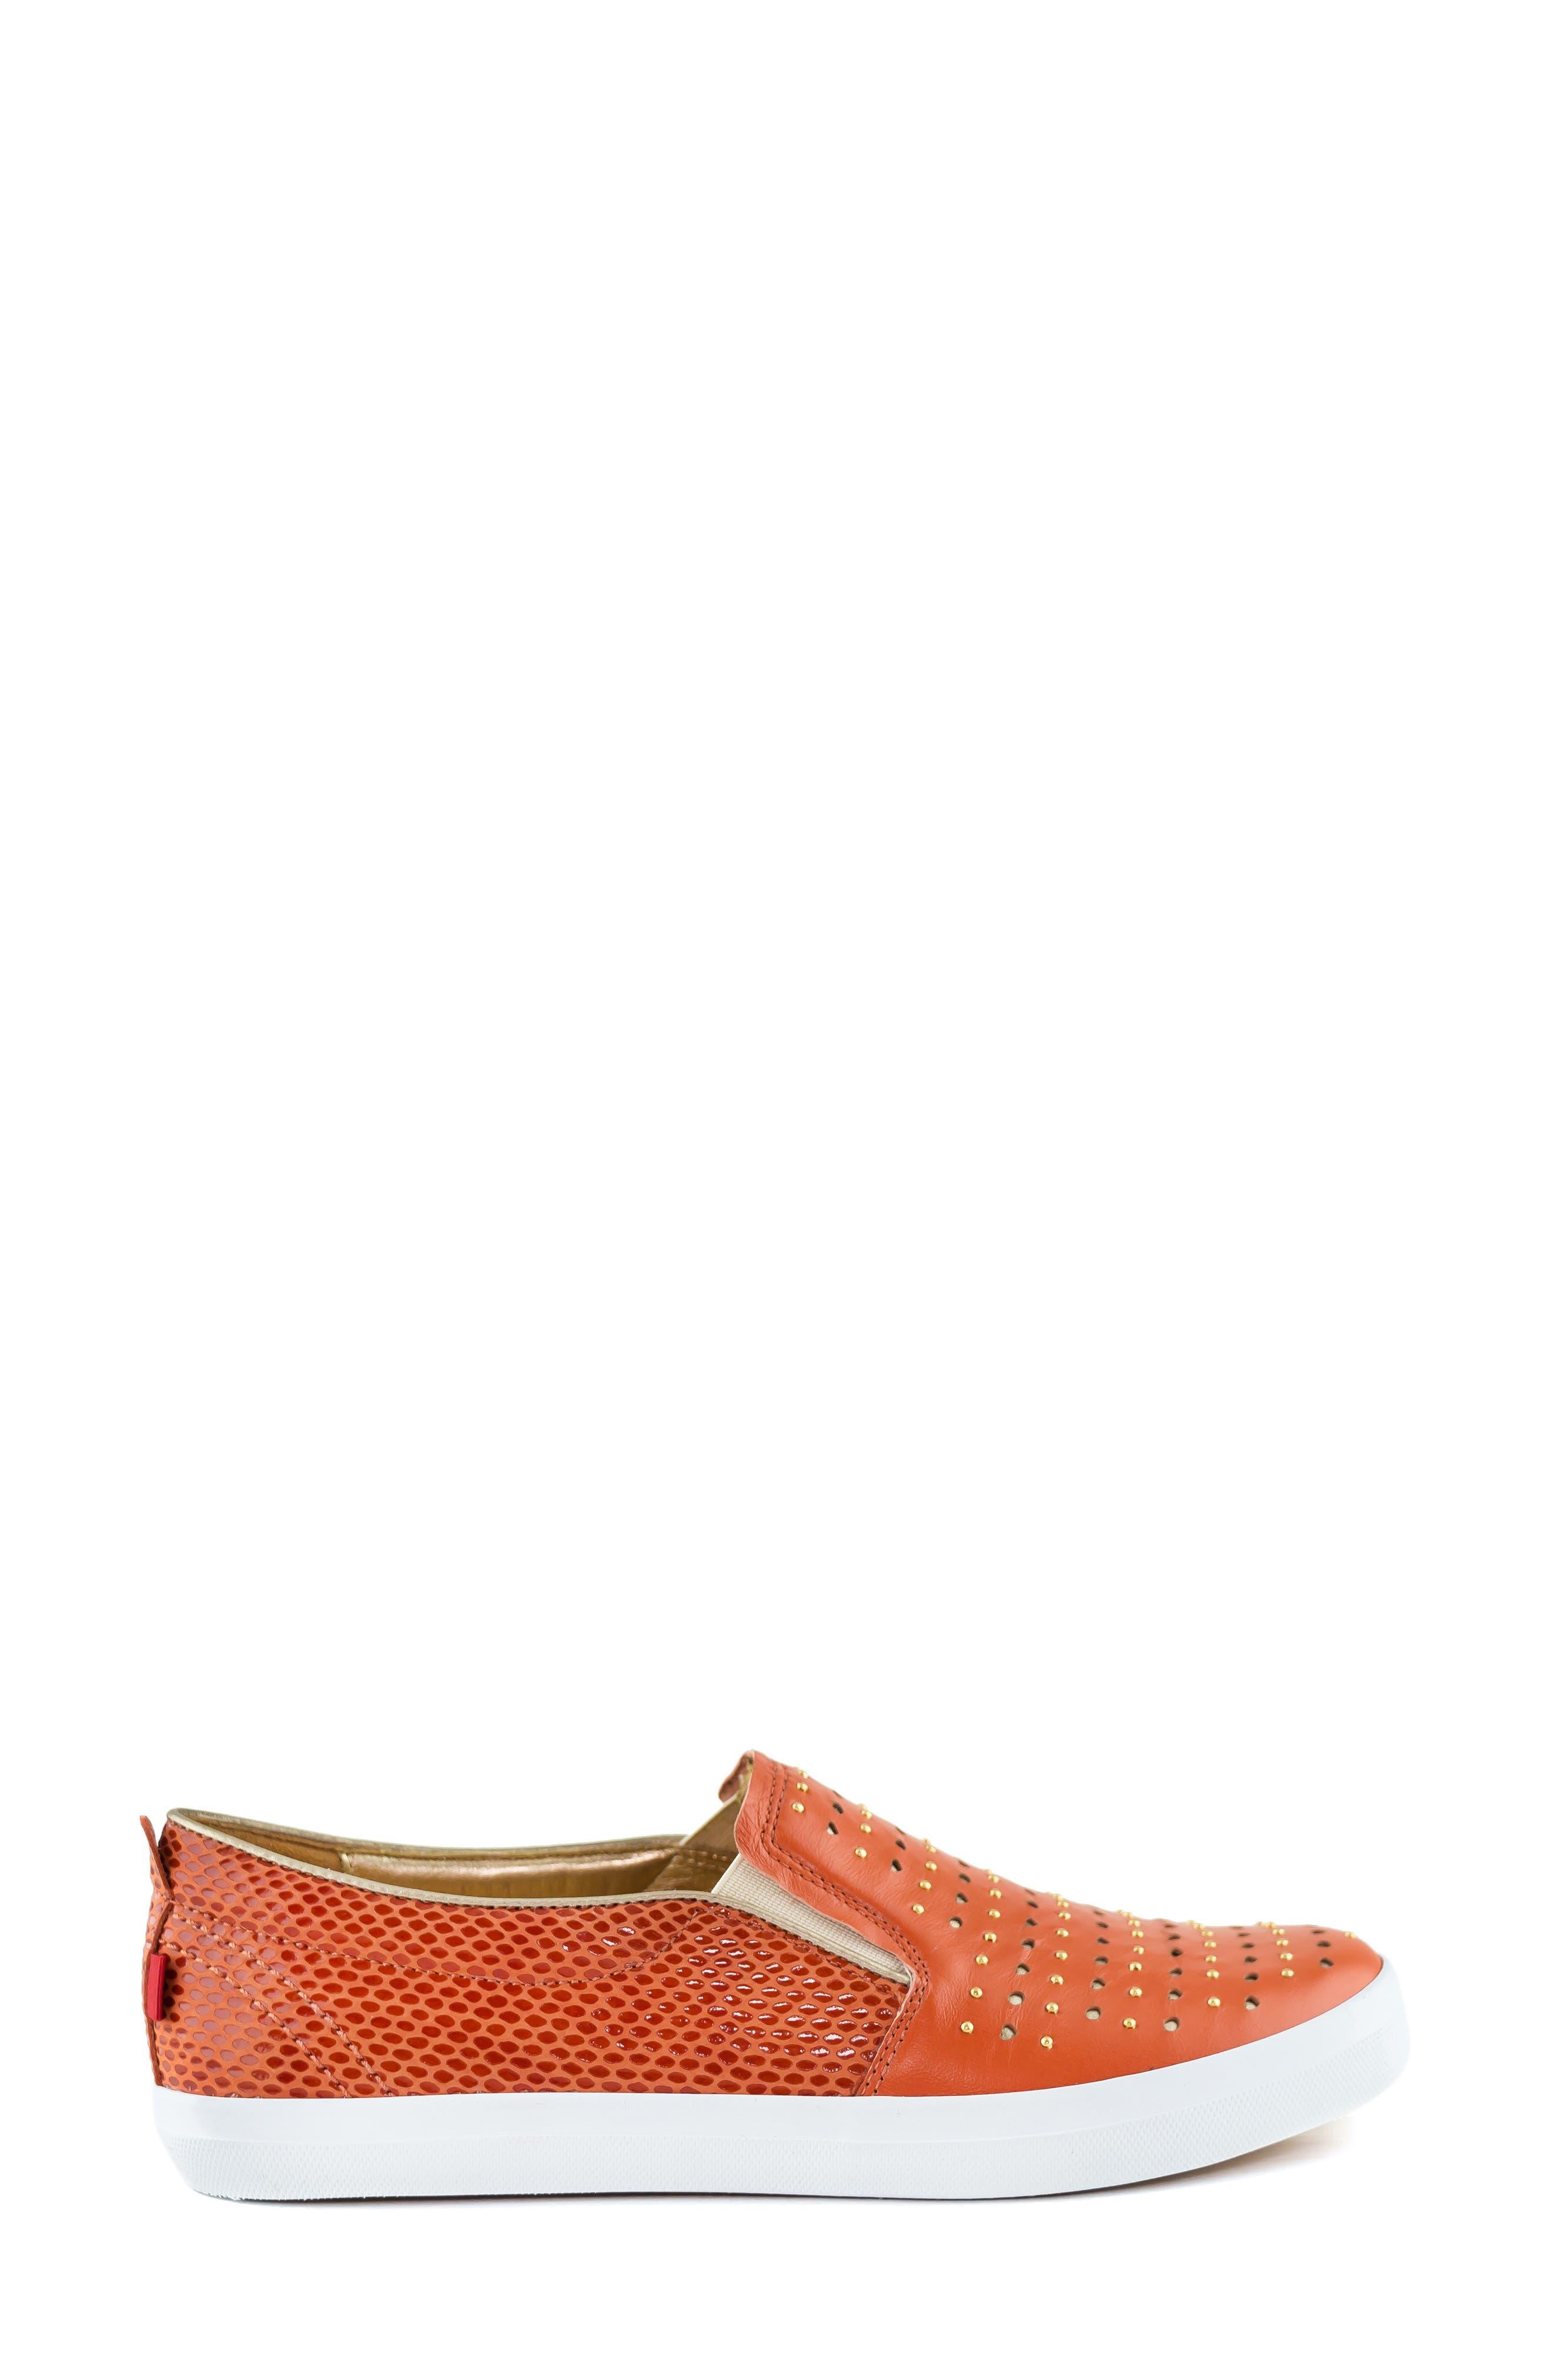 MARC JOSEPH NEW YORK, Soho Sneaker, Alternate thumbnail 3, color, CORAL LEATHER